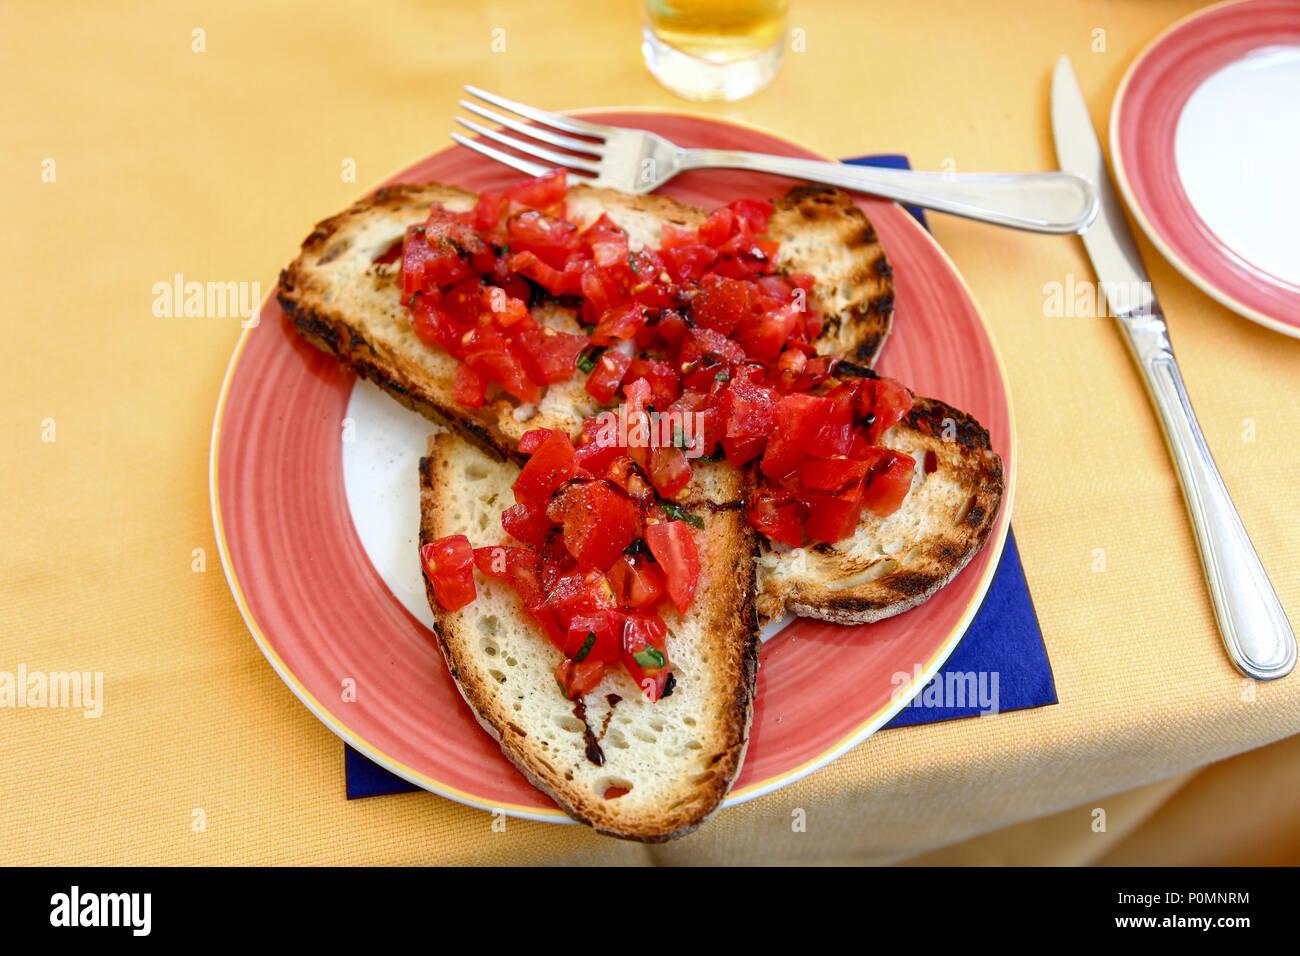 Tomato Bruschetta on a café table in Sorrento, Italy - Stock Image